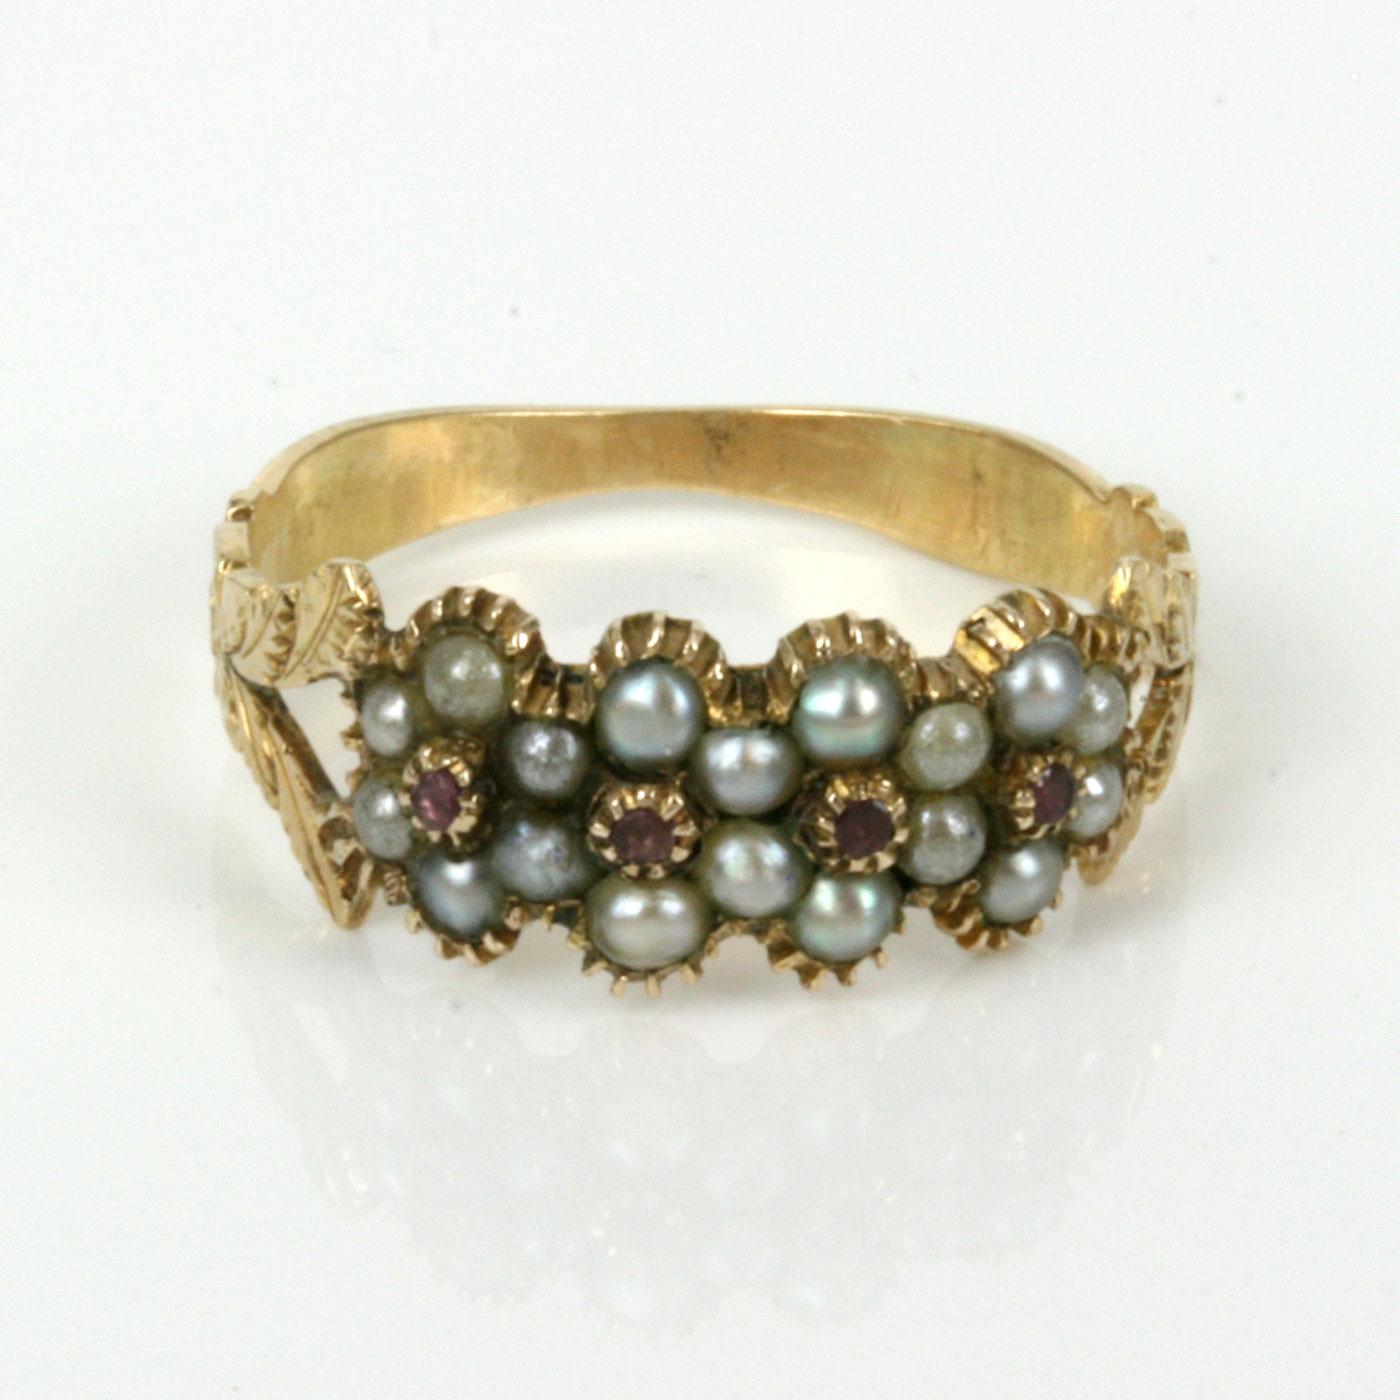 Buy Antique Georgian Era Pearl Amp Ruby Ring Sold Items